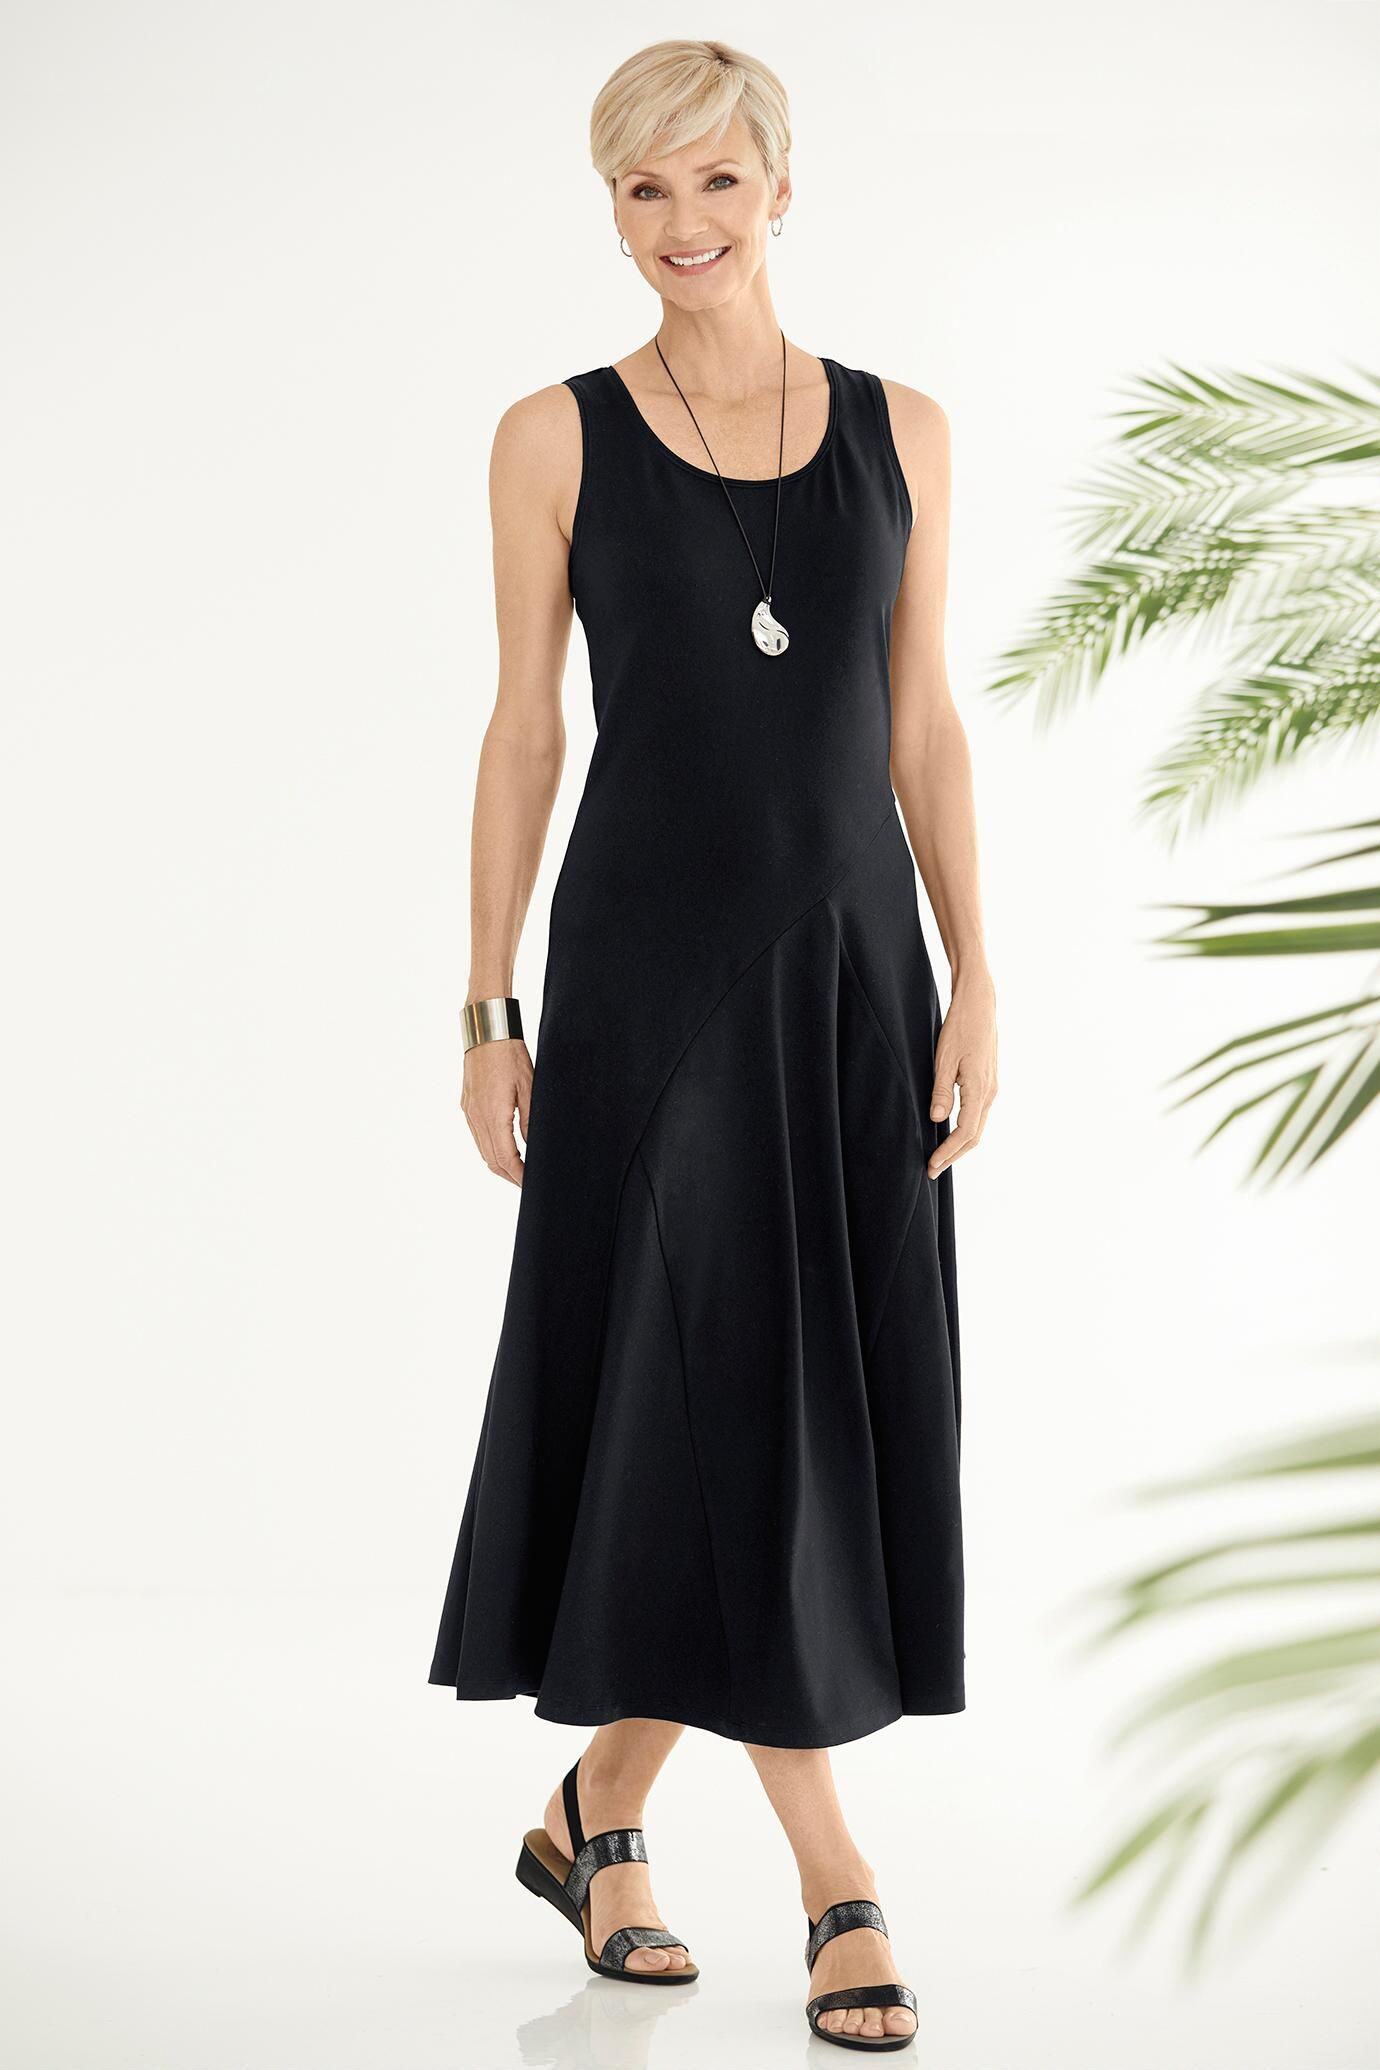 Indispensable tank maxi dress travelsmith 5900 79